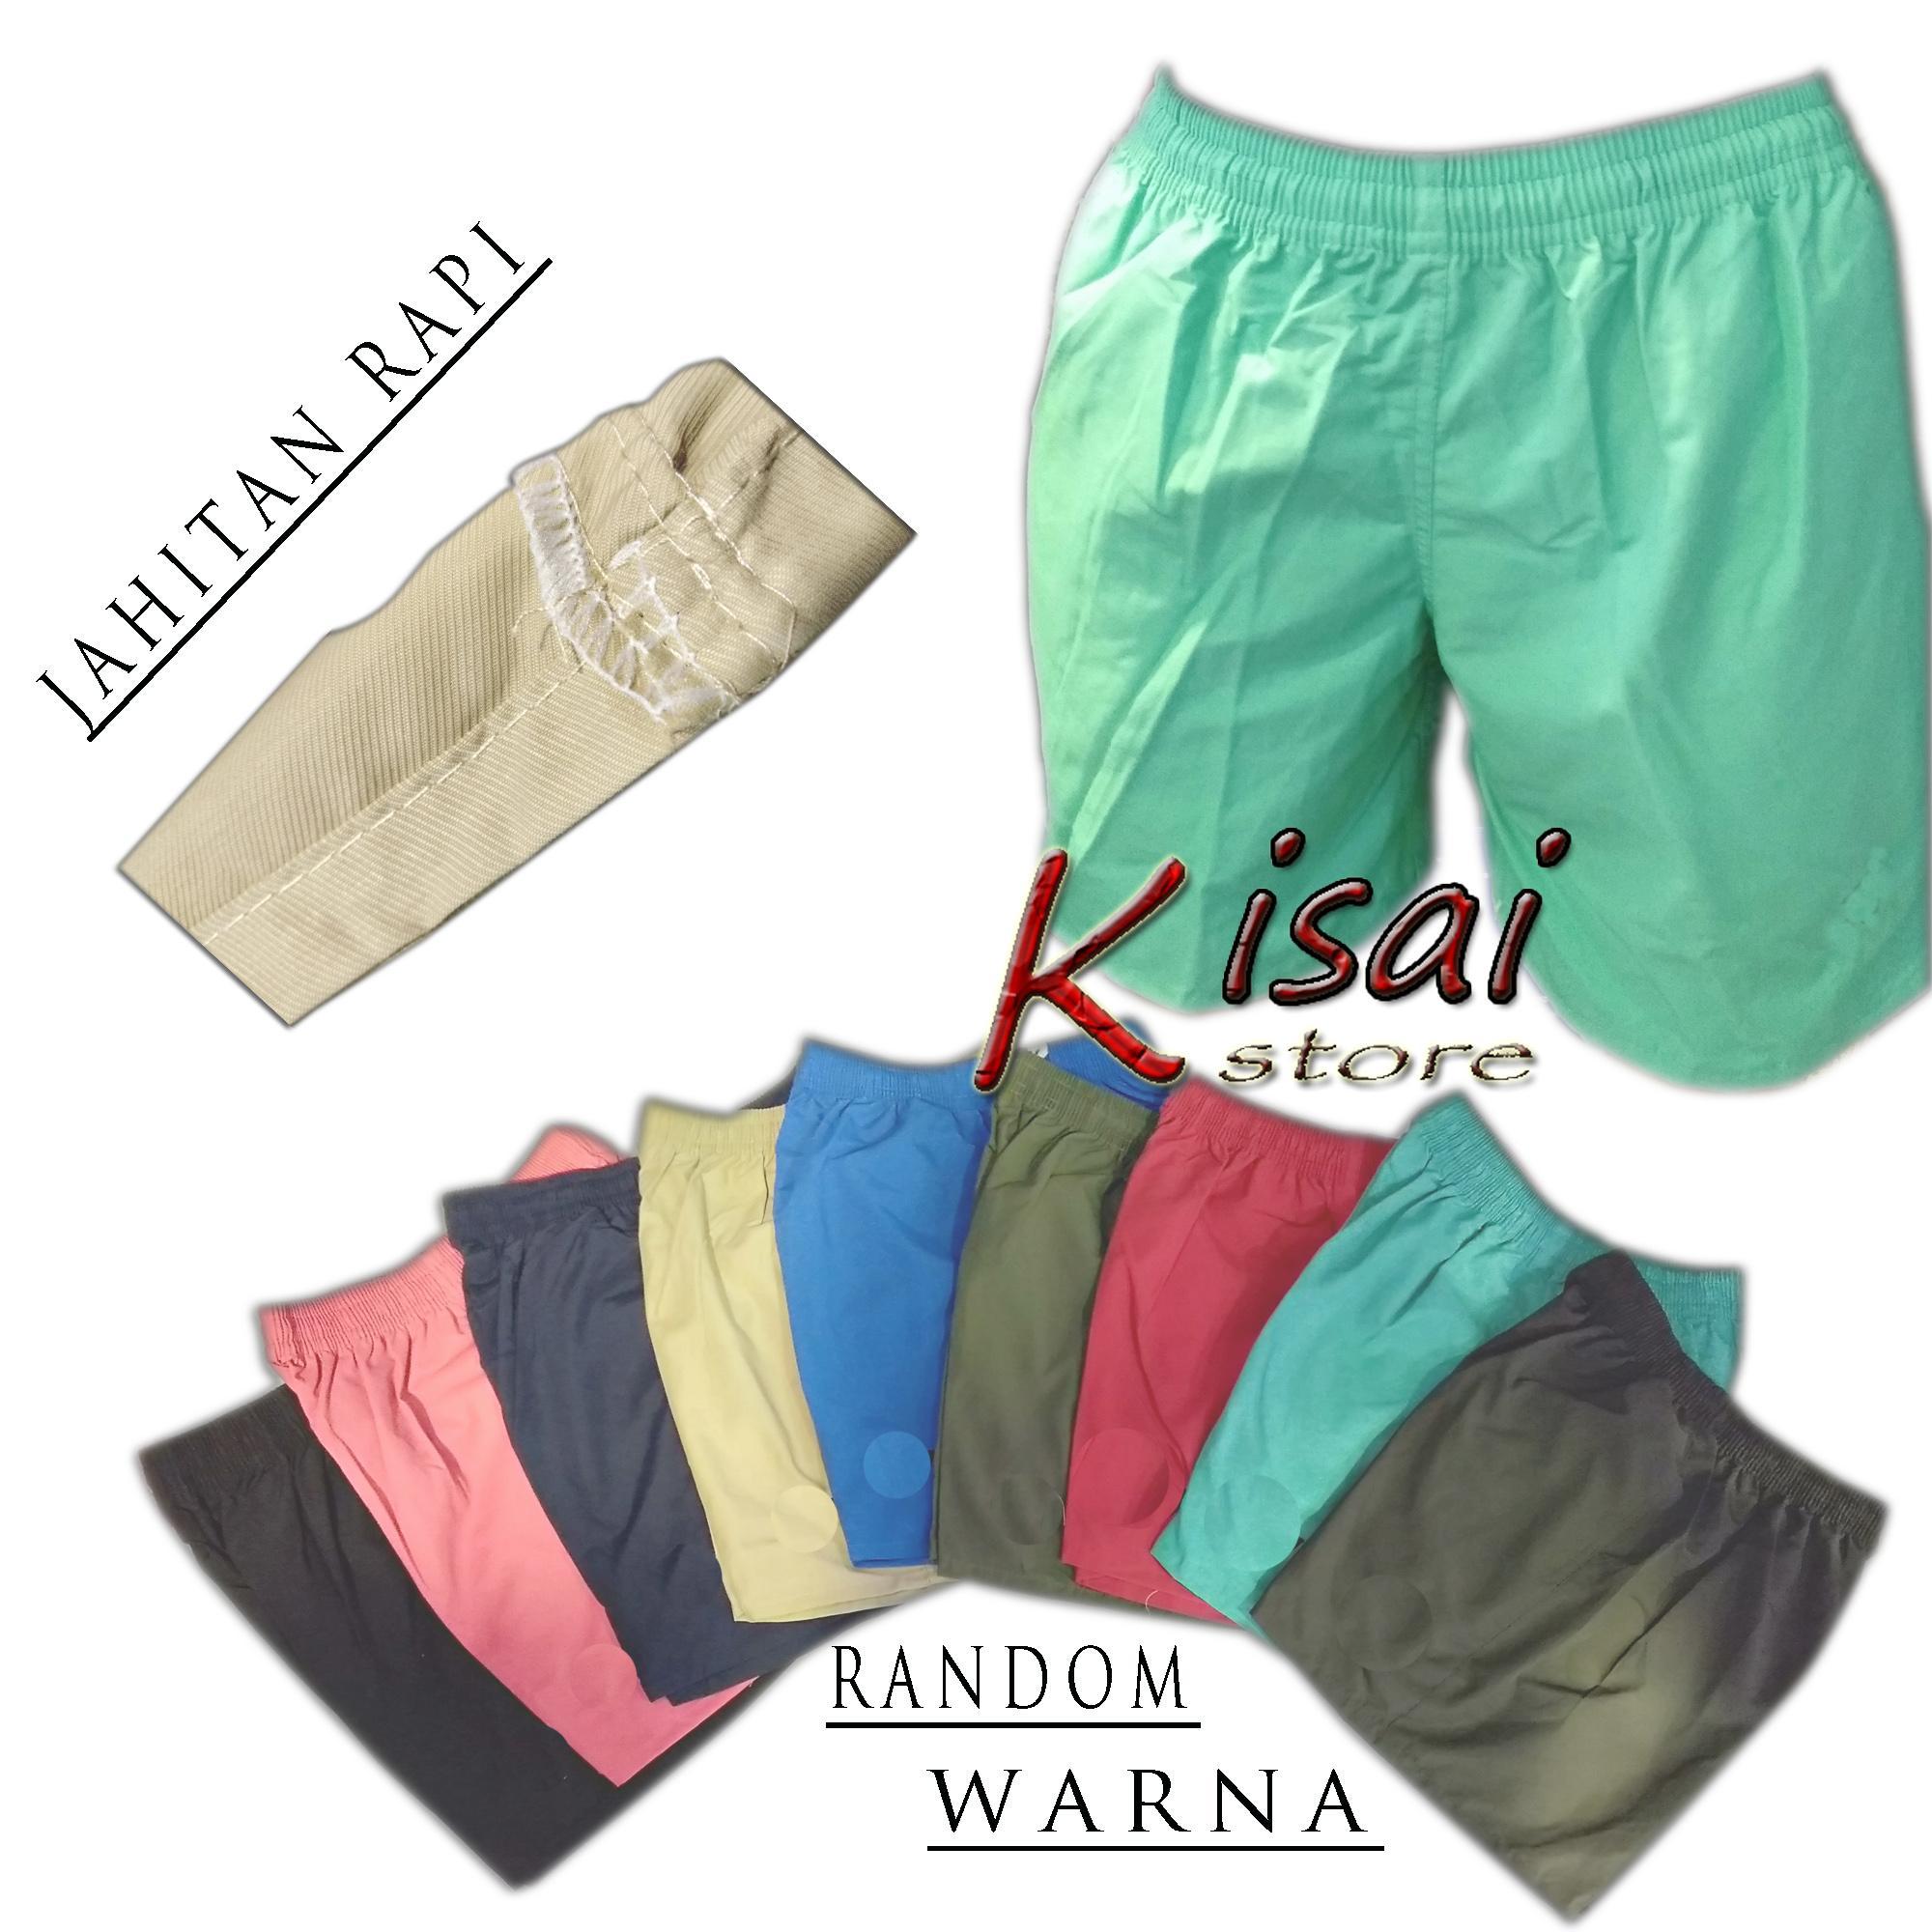 1pcs Celana Pendek Wanita - Celana Santai Pria/wanita - Celana Pendek Pria - Harga Grosir - Y0n3x By Kisai Store.